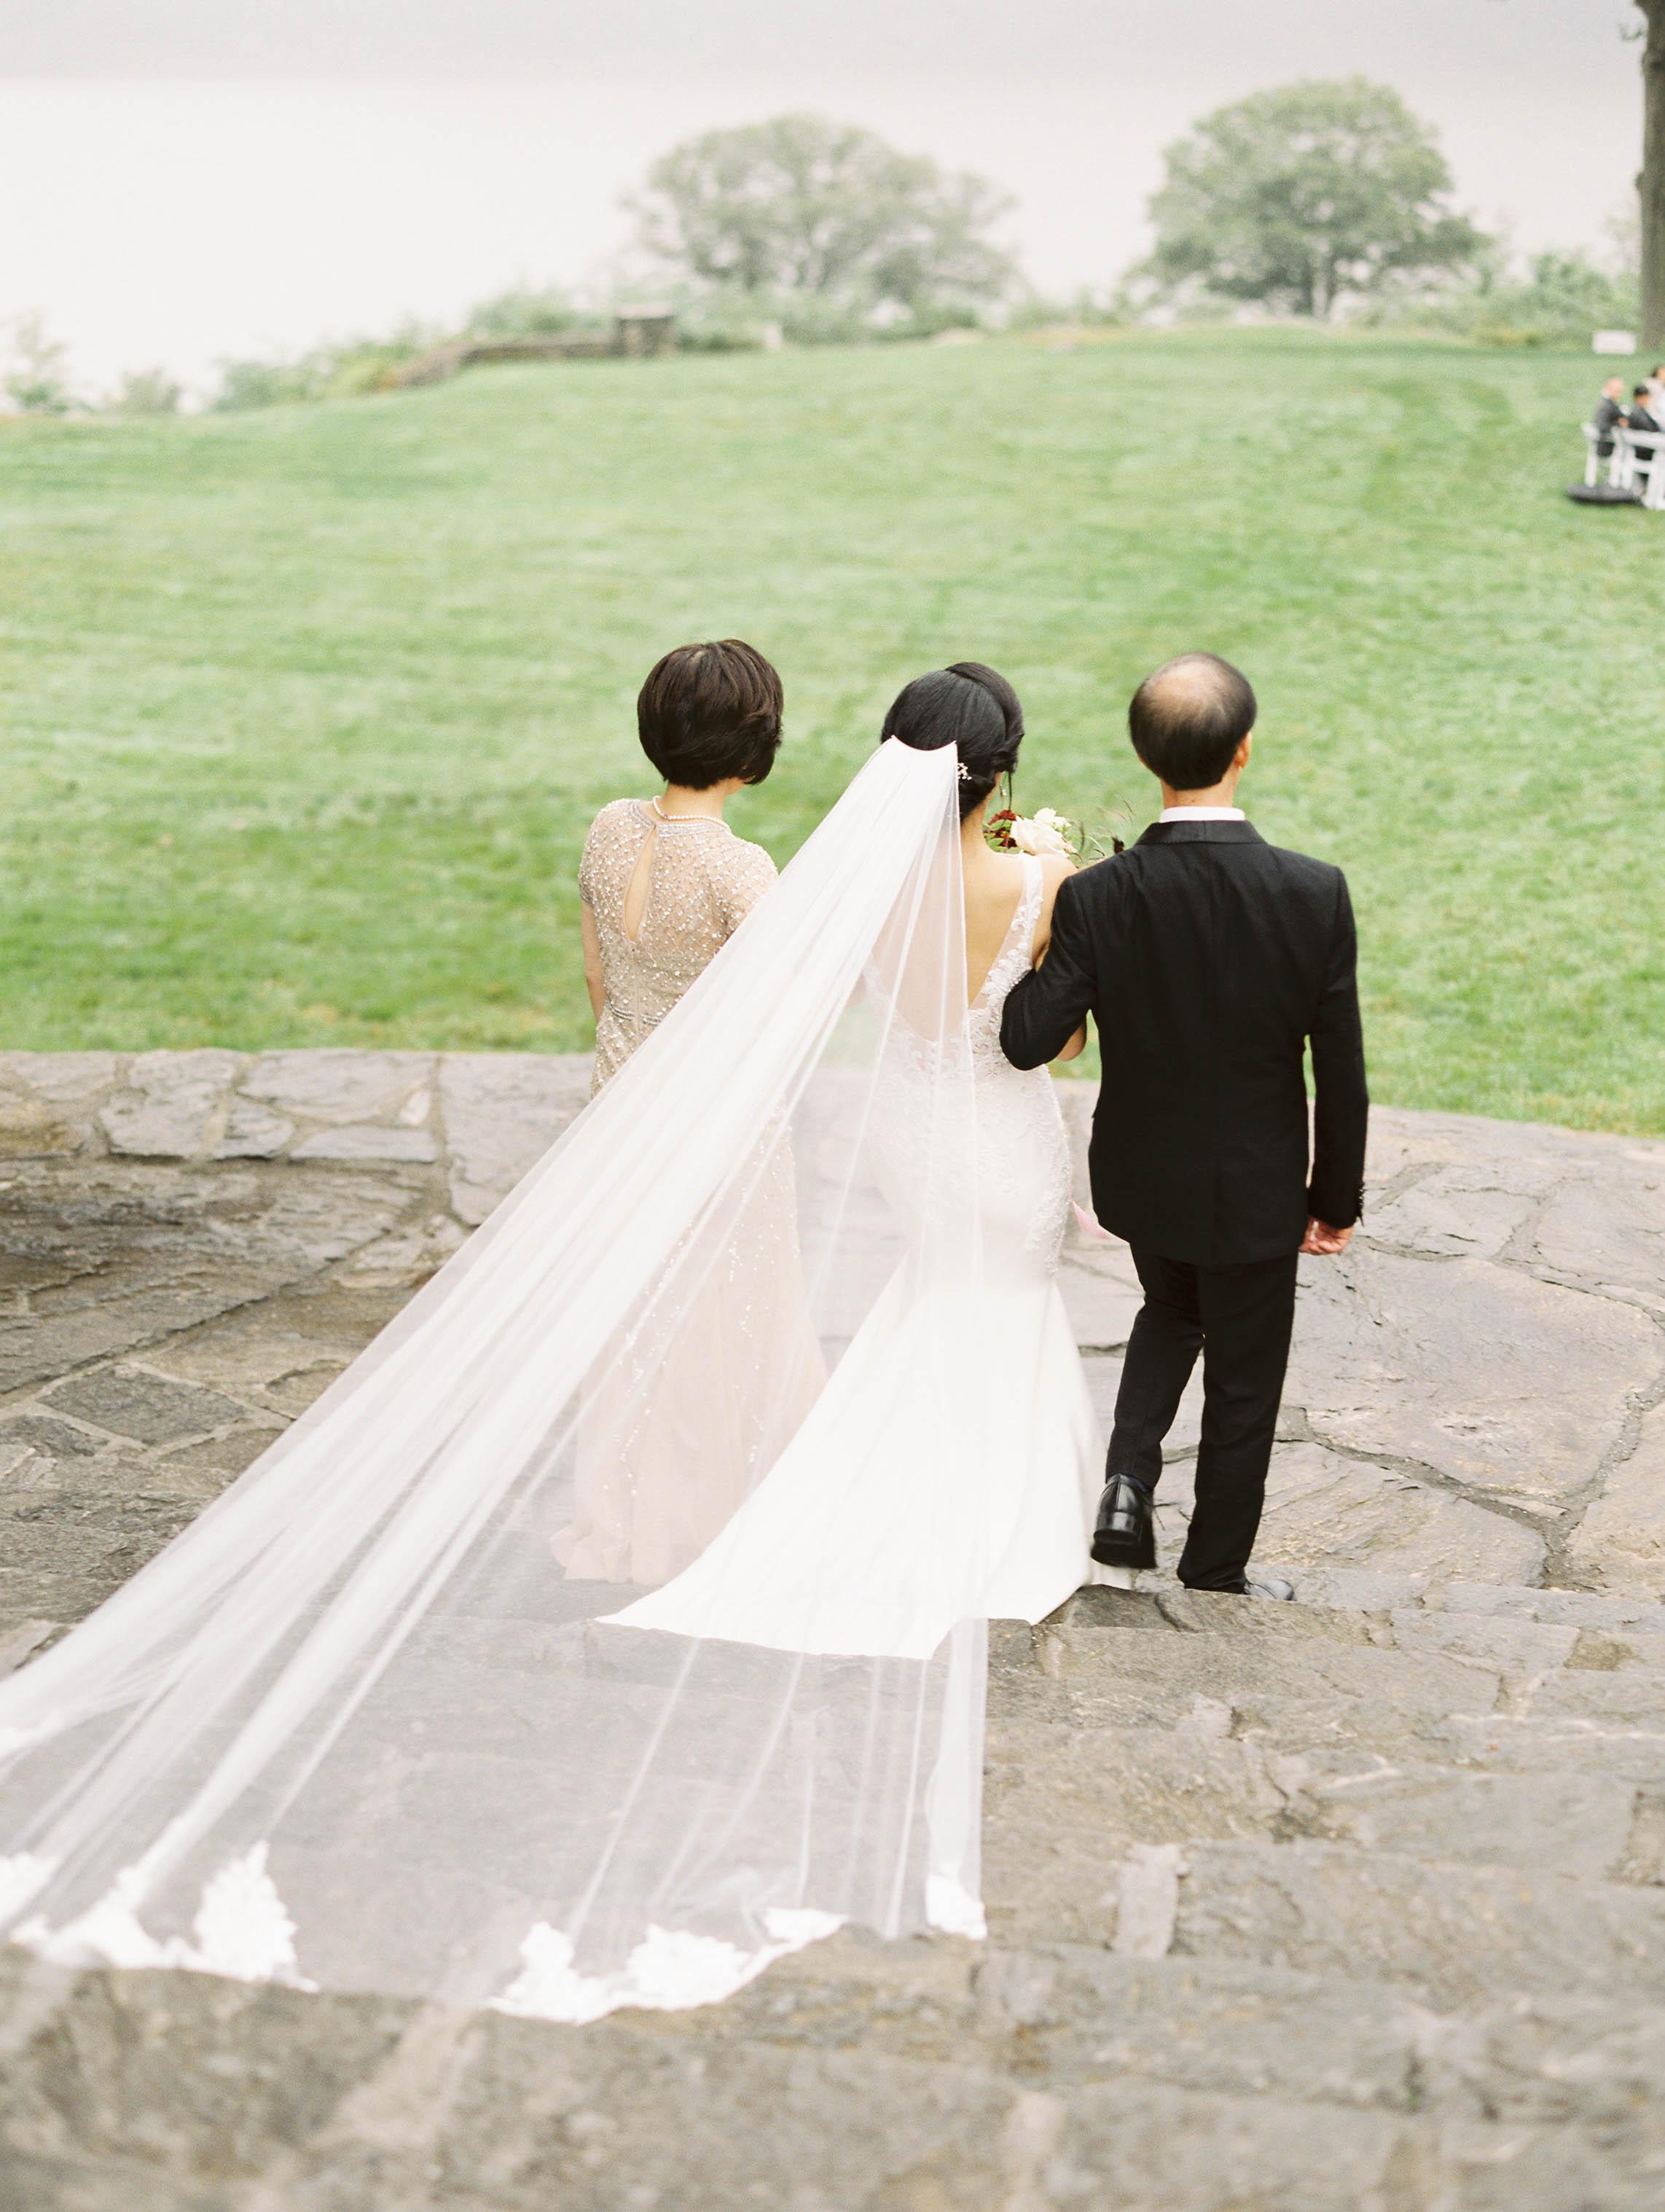 kelsandmichael_weddingphotography_ny-11.jpg